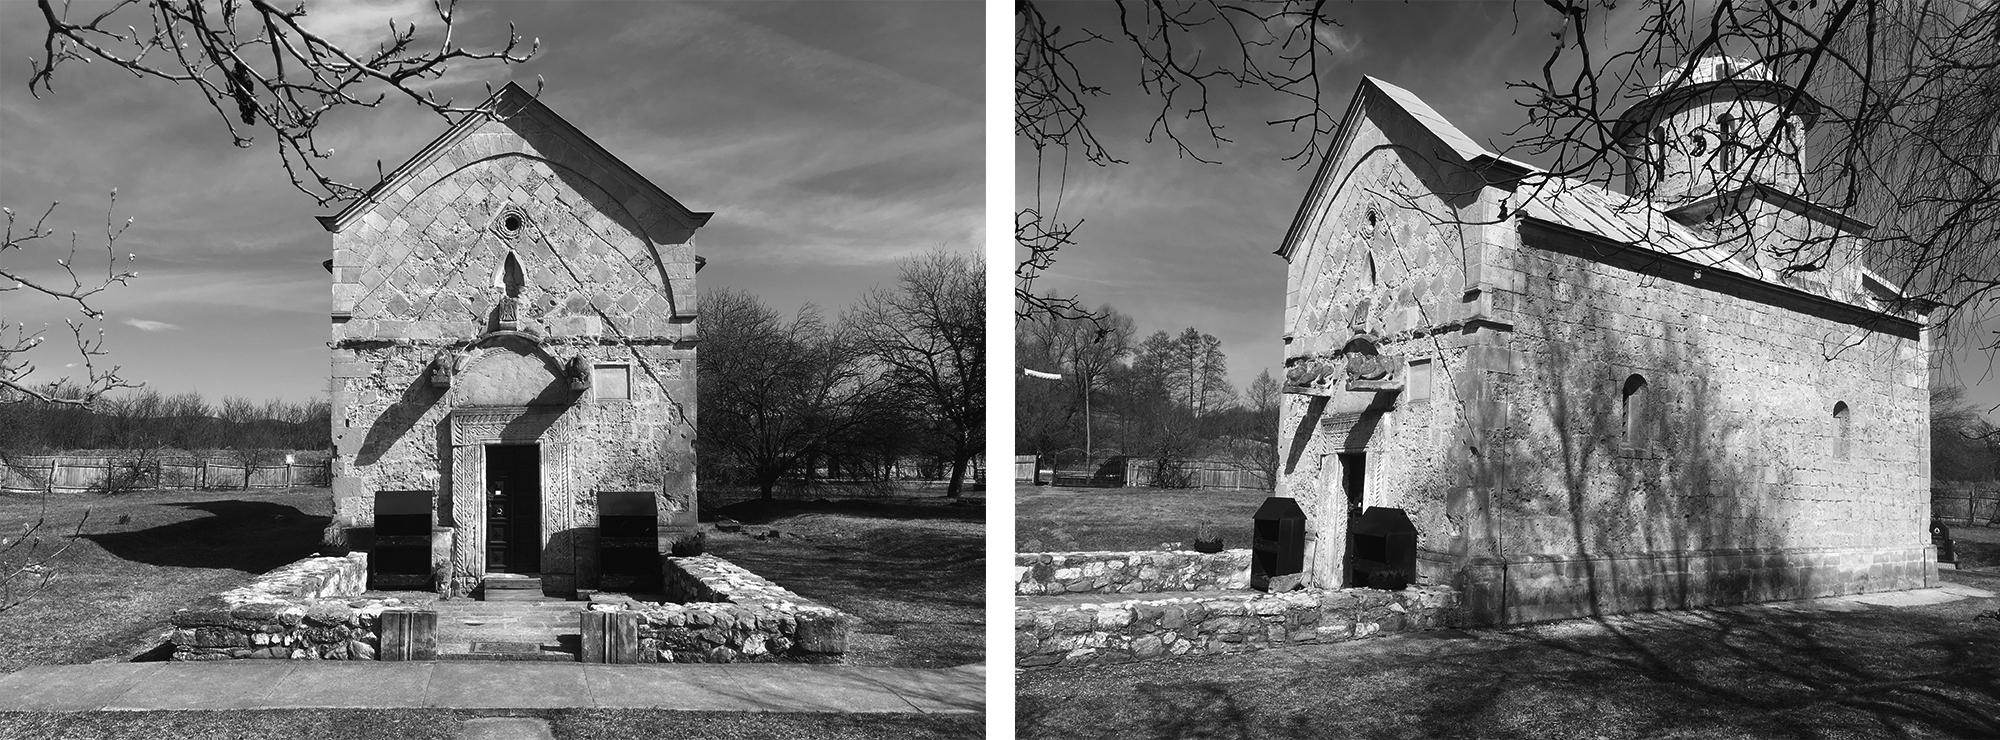 The Ceramic Vessels of Trg: Acoustic Wall Construction in a Medieval Serbian Church | Zorana Đorđević, Dragan Novković, & Filip Pantelić